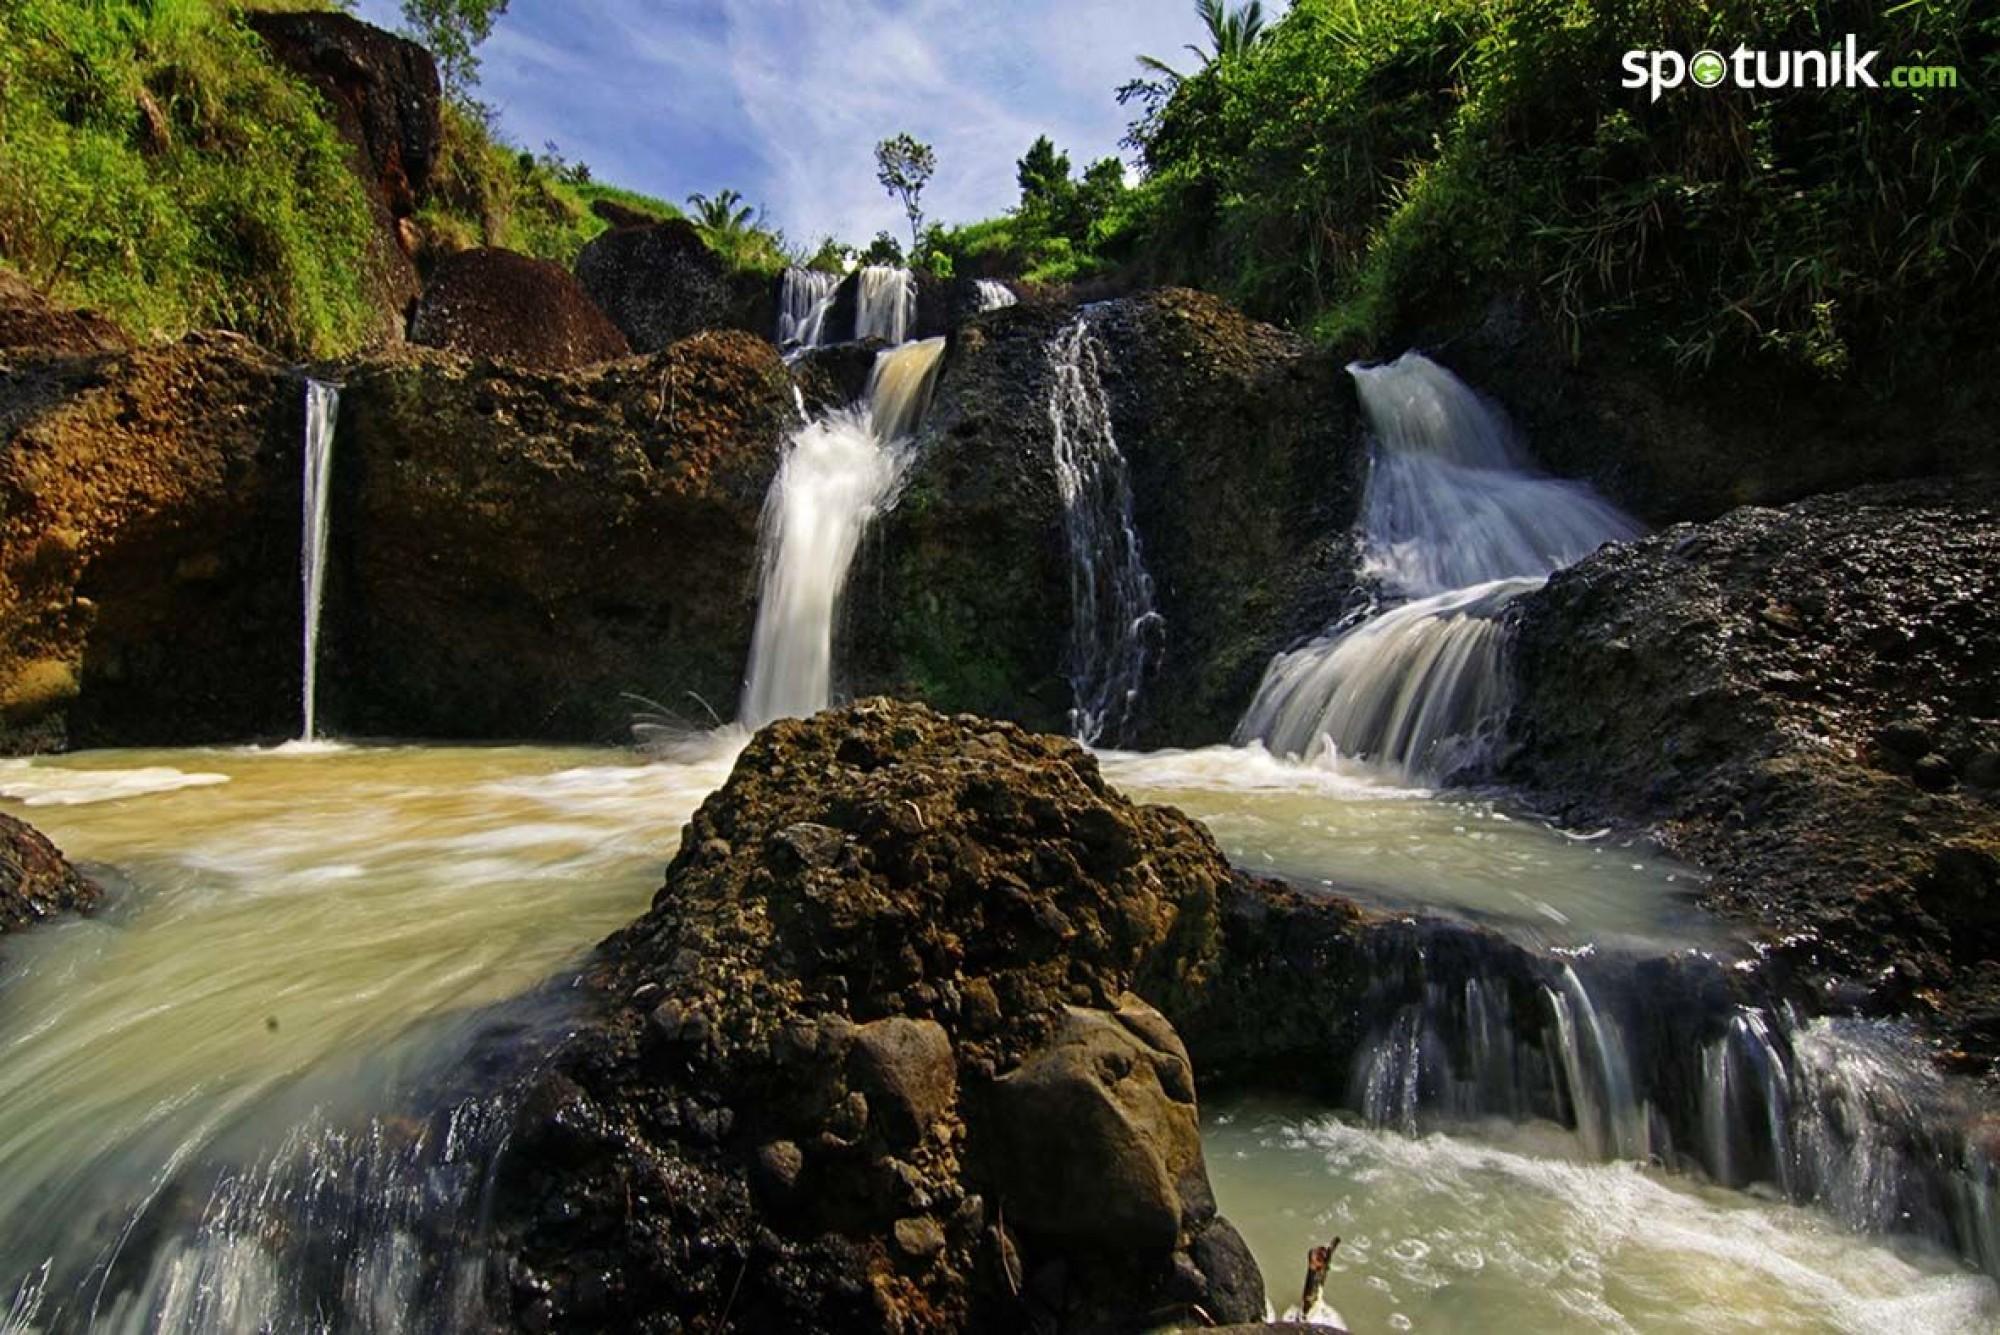 Air Terjun Kedung Kandang Pesona Patuk 20160602102244 Jpg Kab Gunungkidul